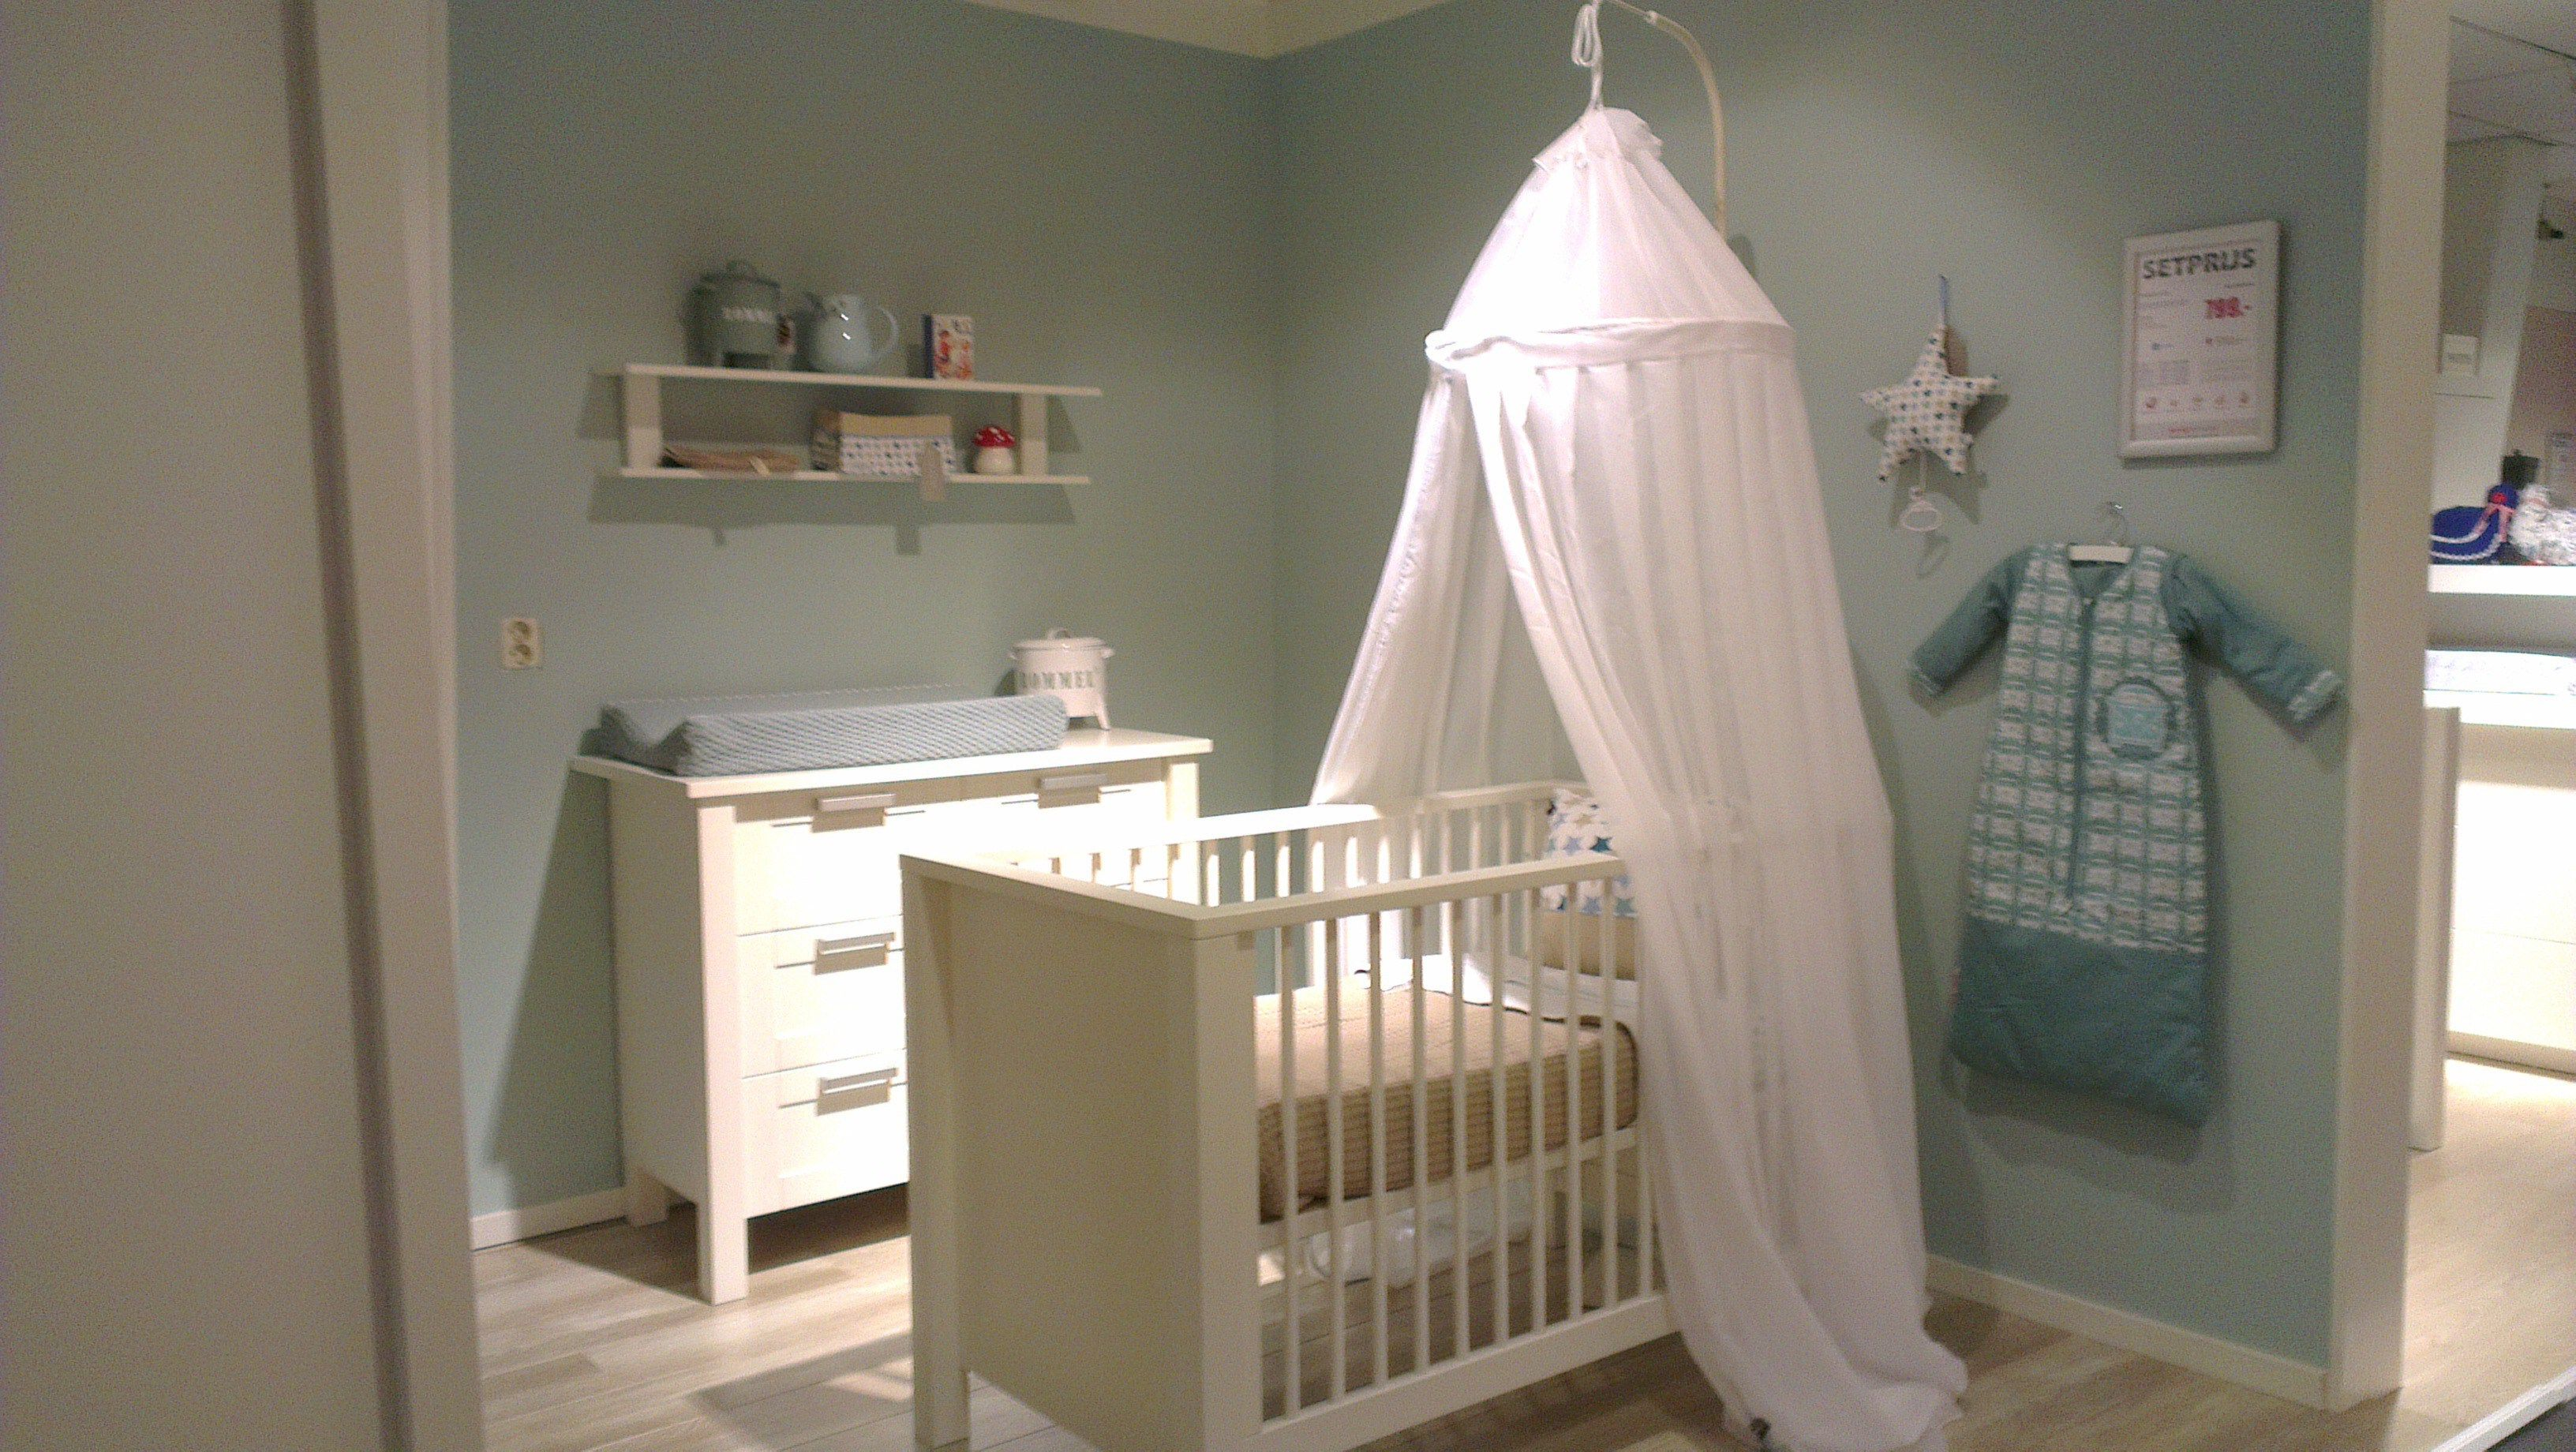 Waar Babykamer Kopen.Waar Babykamer Kopen Rsvhoekpolder